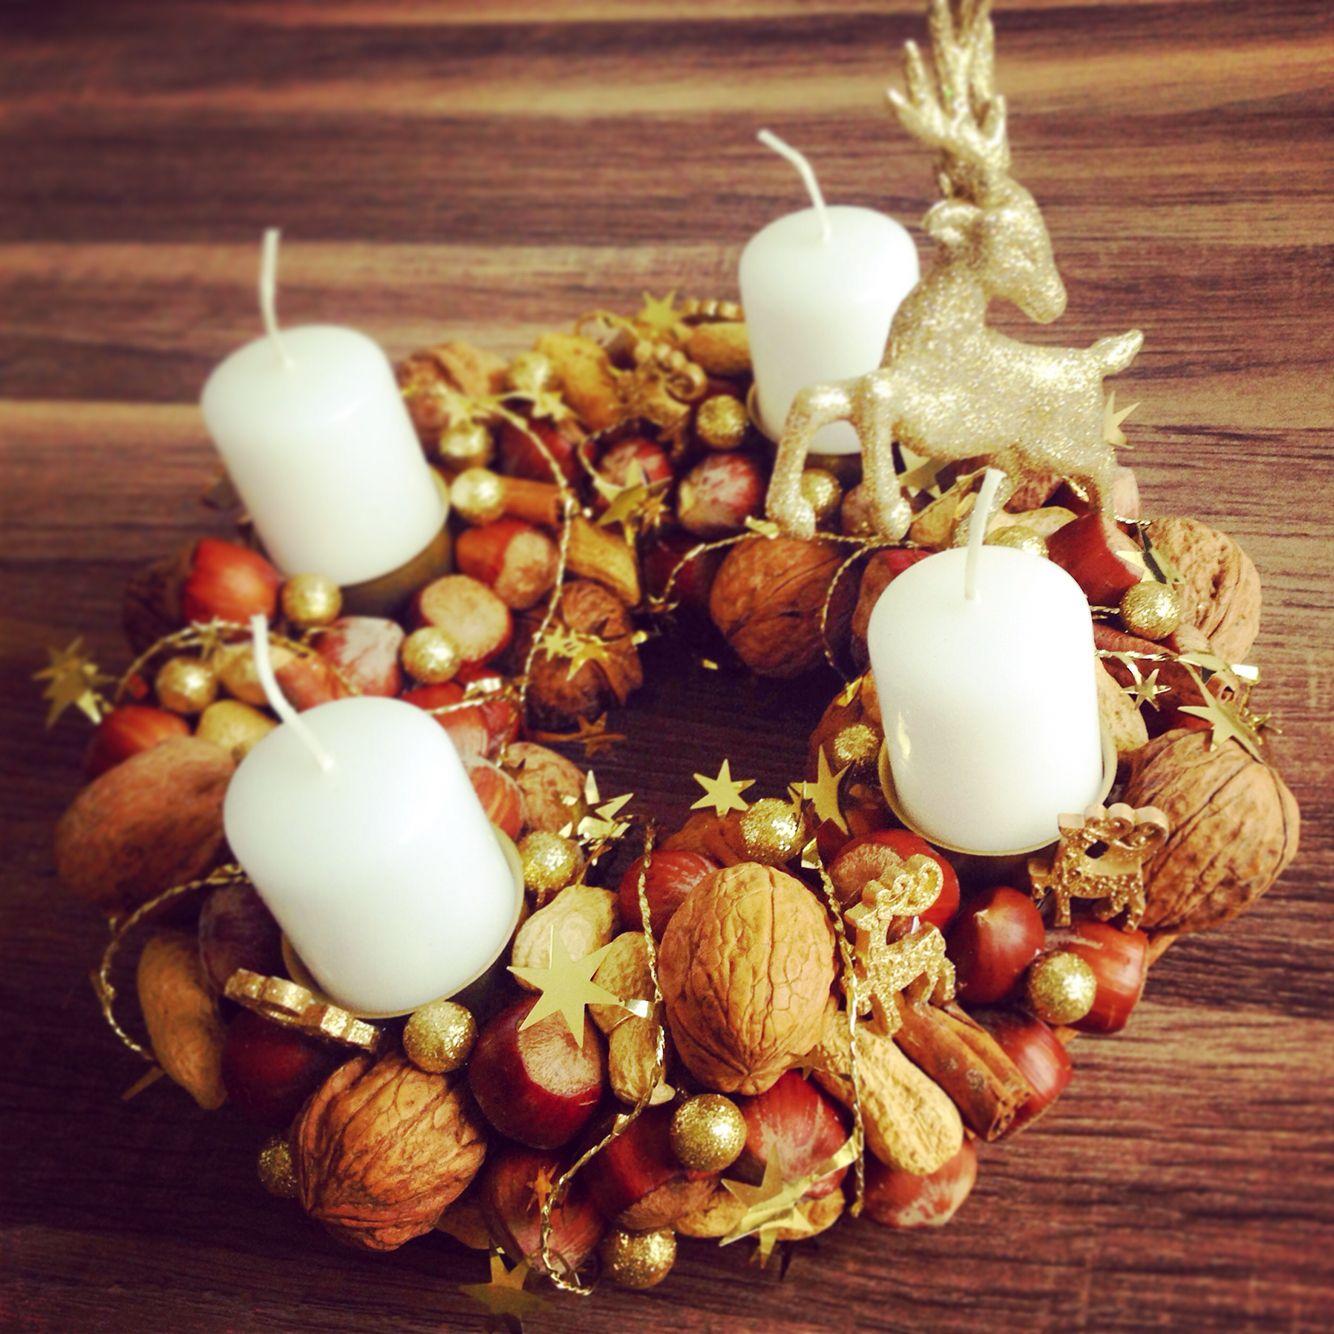 adventskranz mit n ssen und rentieren in gold christmas decoration with nuts and reindeers in. Black Bedroom Furniture Sets. Home Design Ideas